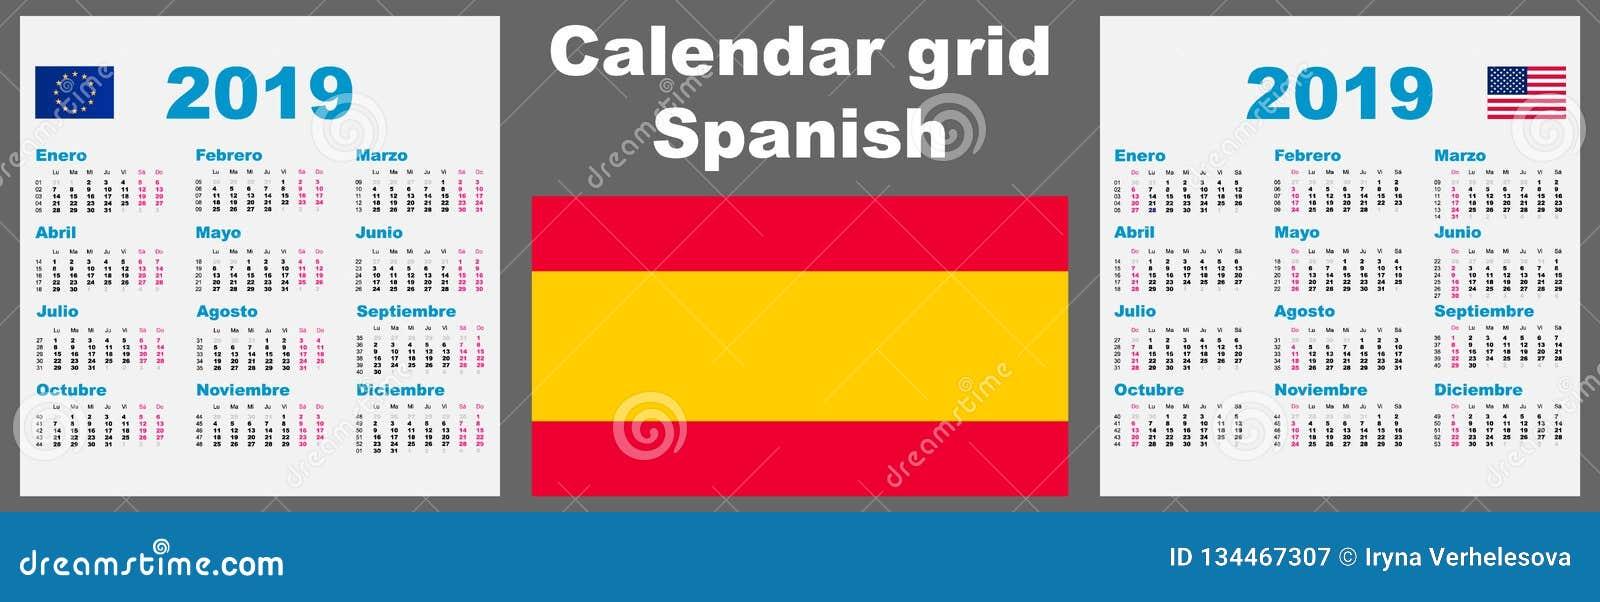 Espagnol De Calendrier 2019 Calibre Regle Hispanique D